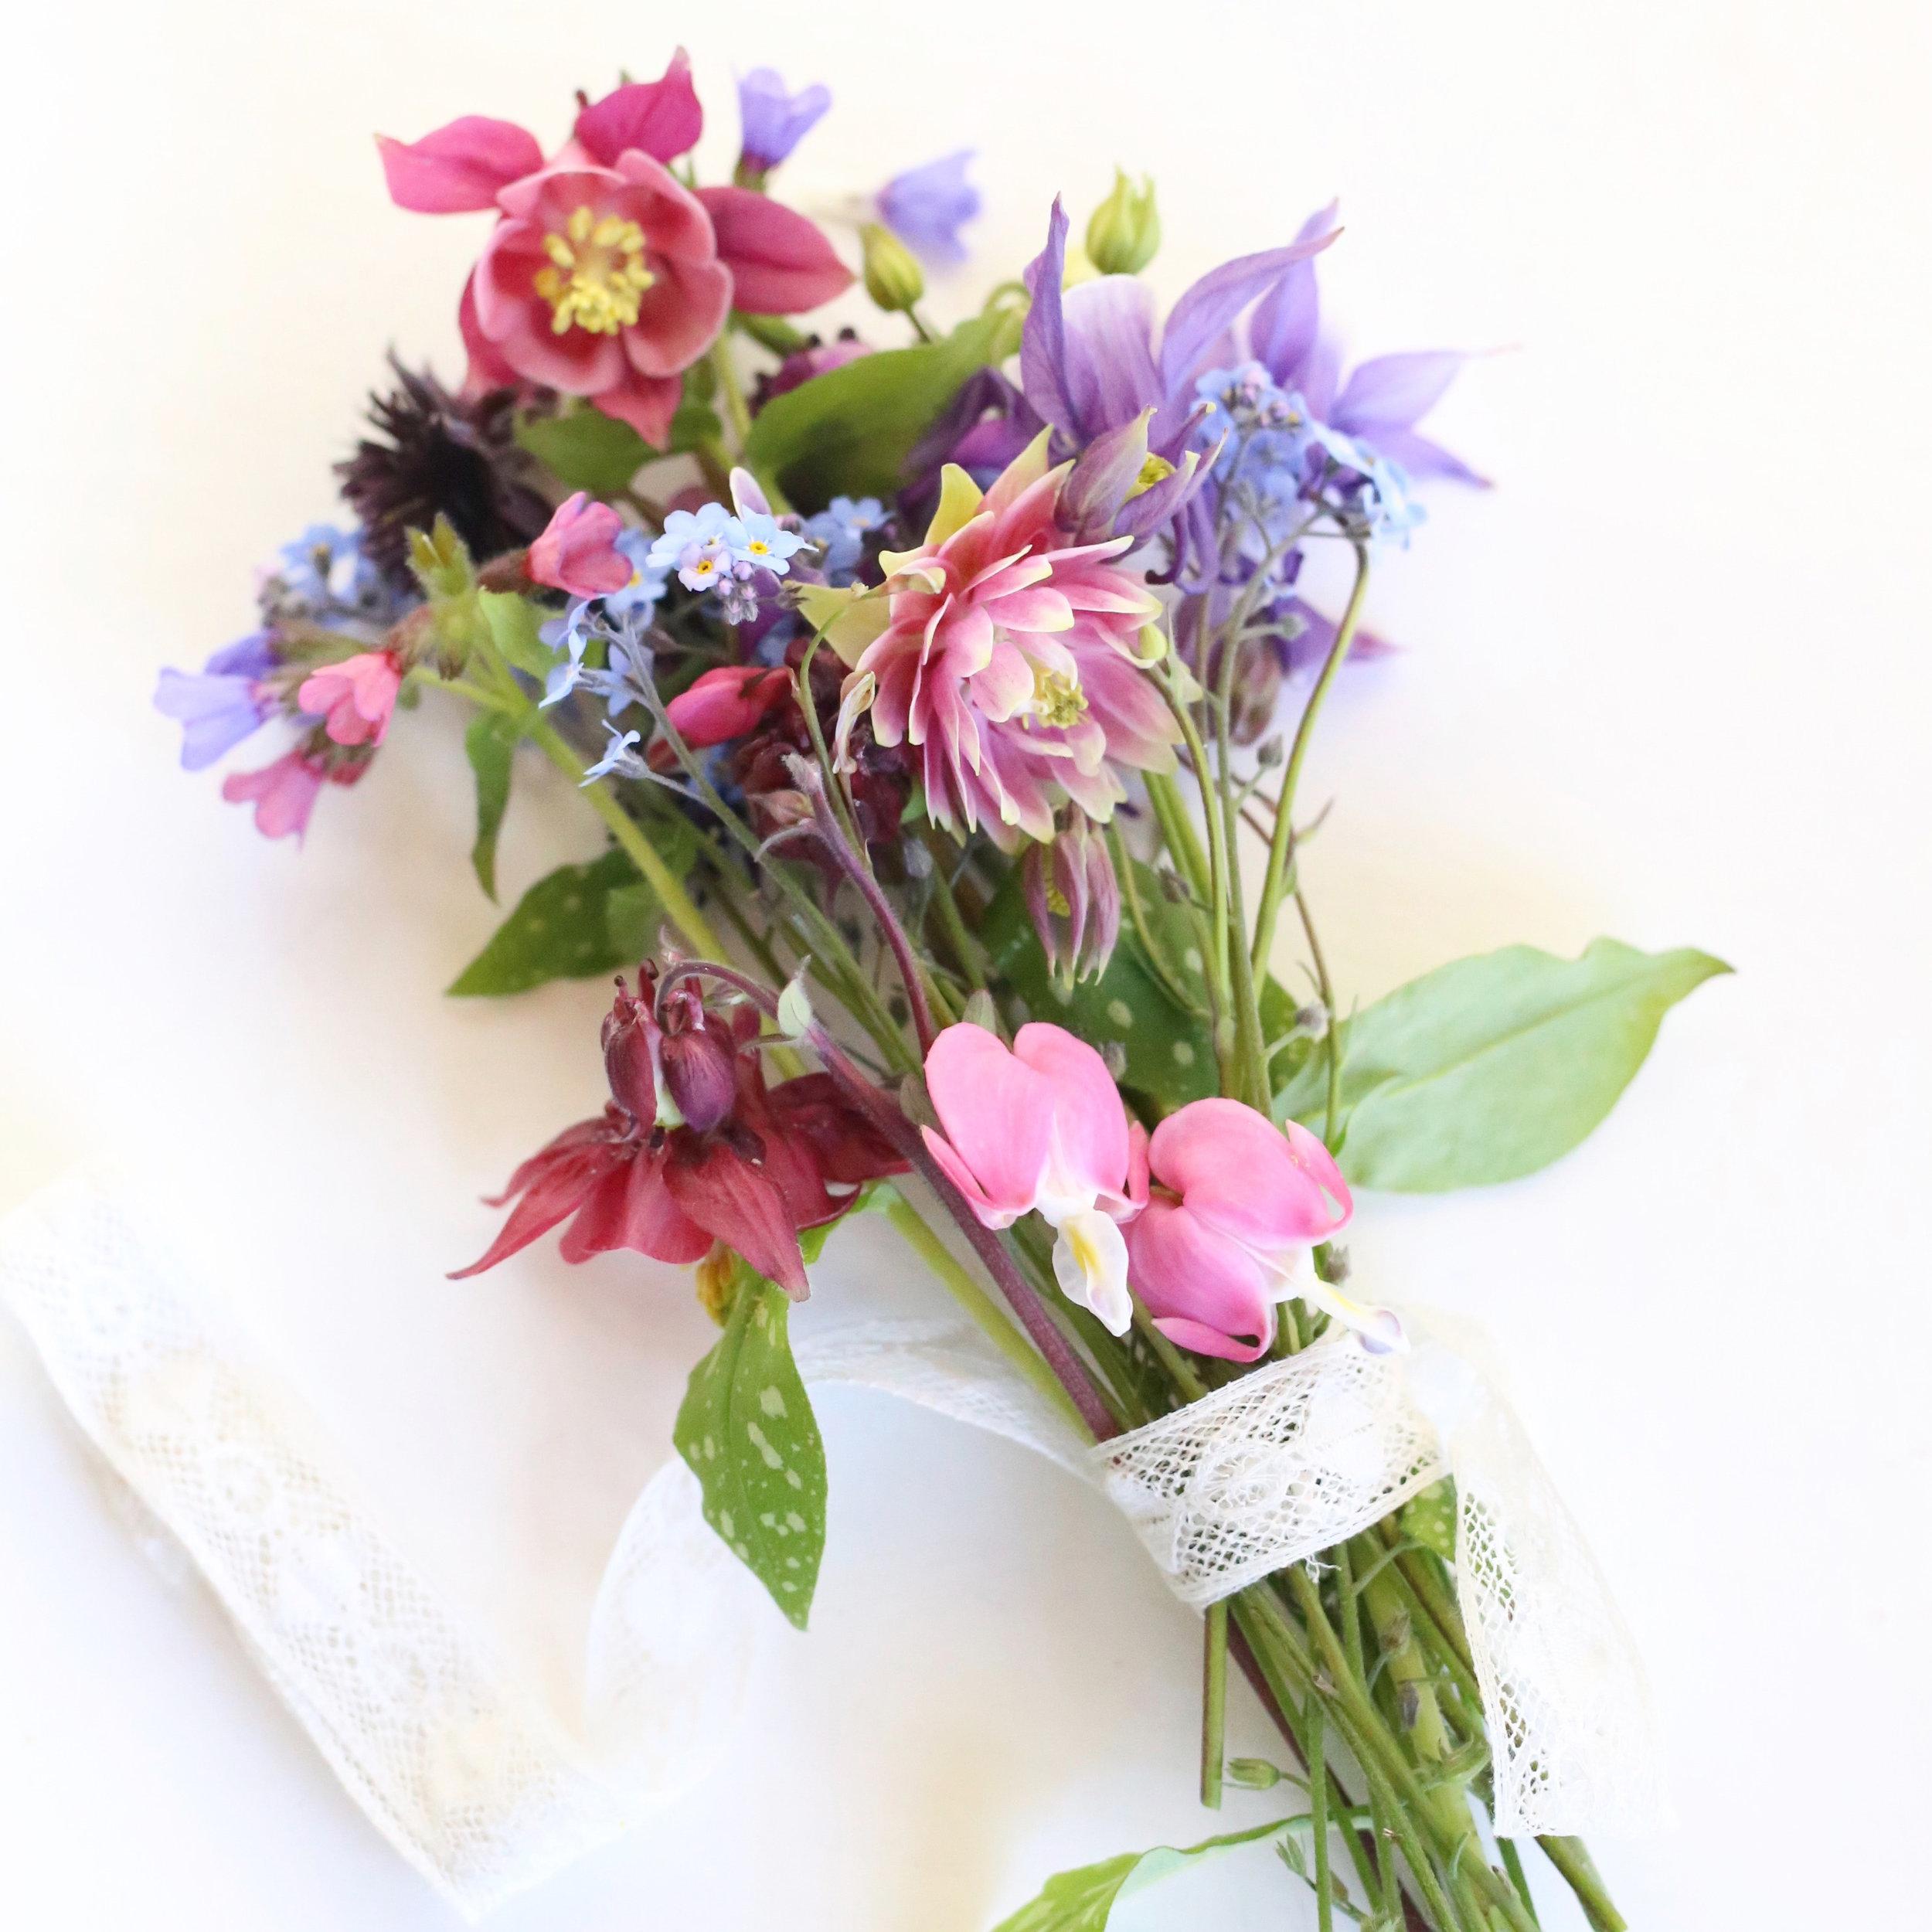 04Mar_Garden_Flowers.jpg